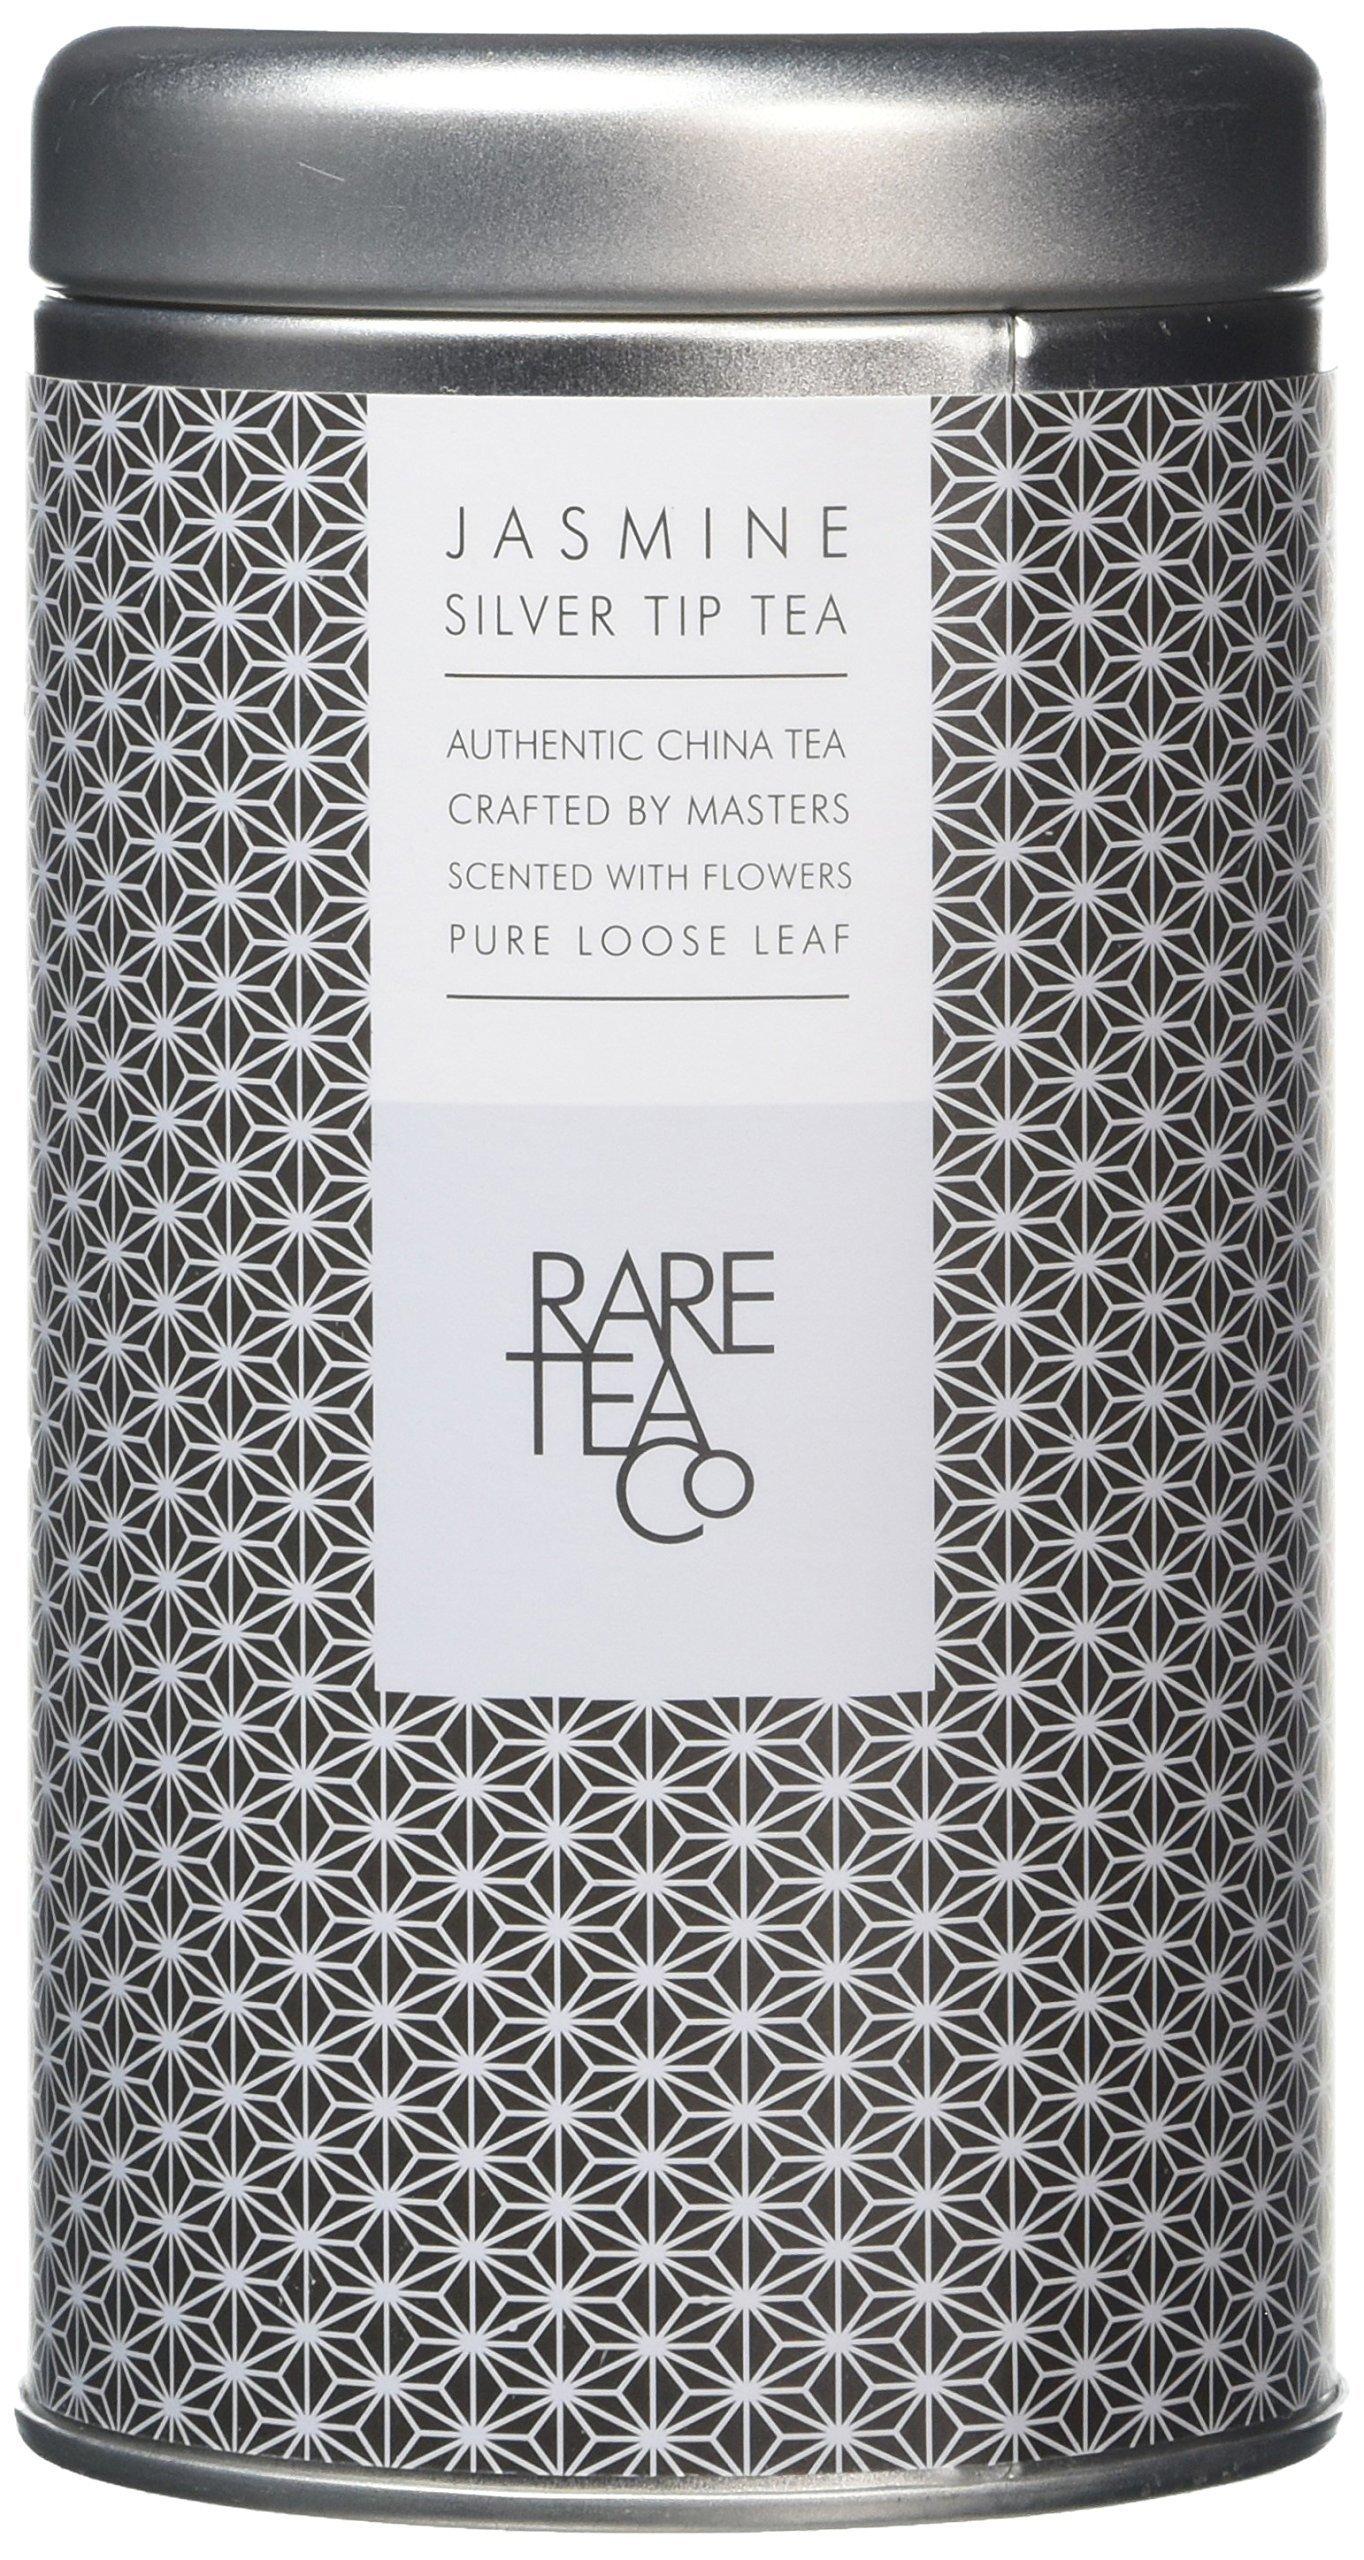 Rare-Tea-Company-Jasmine-White-Silver-Tip-1er-Pack-1-x-25-g